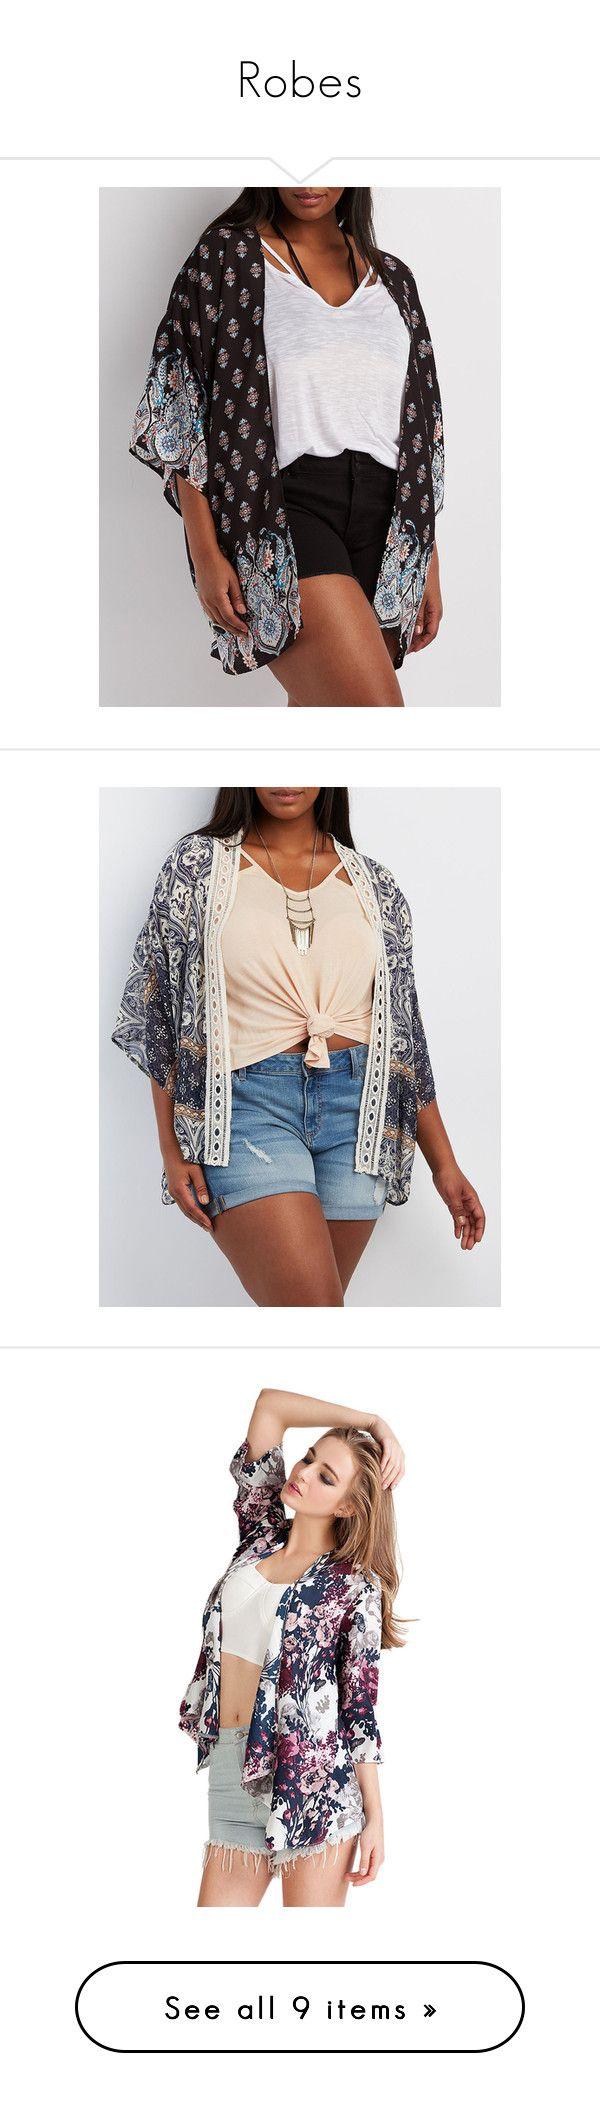 """Robes"" by sharoncowdery ❤ liked on Polyvore featuring plus size women's fashion, plus size clothing, plus size intimates, plus size robes, black combo, chiffon kimono, sheer kimono robe, plus size kimono, chiffon slip and sheer robe"